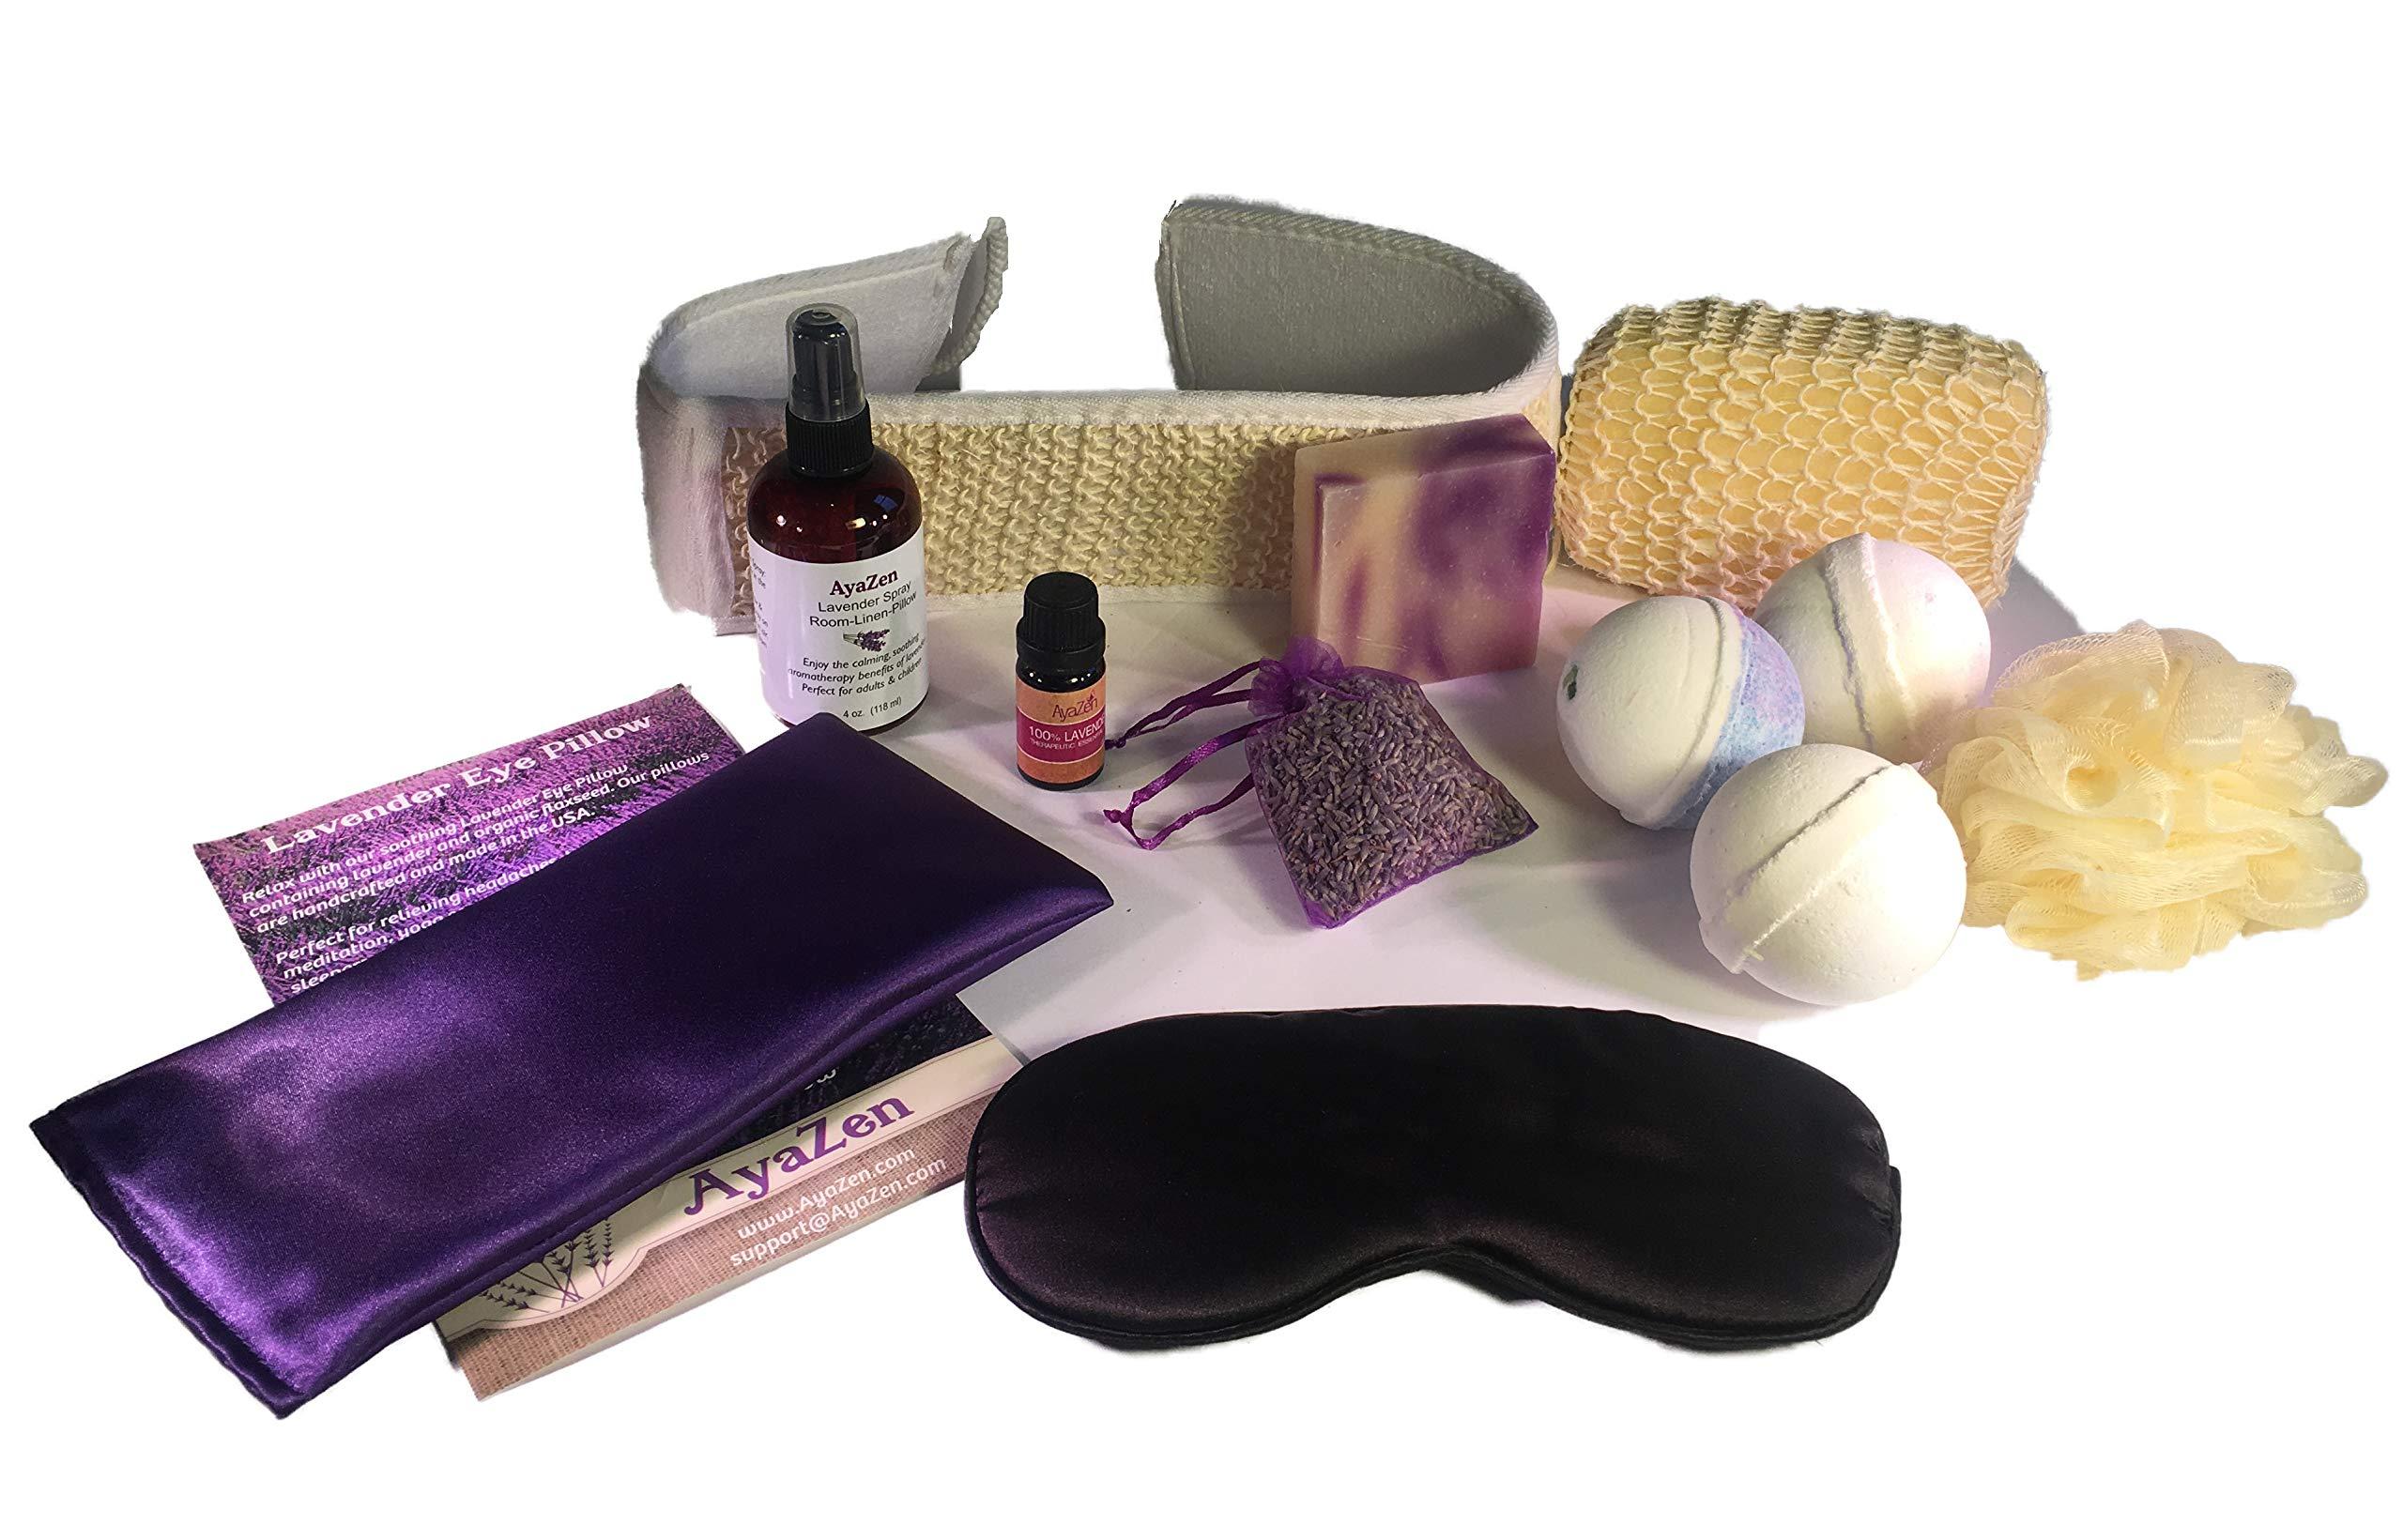 AyaZen Lavender Spa Bath and Body Gift Set-Lavender Eye Pillow, Silk Eye Mask, 3 Large Bath Bombs, Artisan Soap, Lavender Essential Oil, Lavender Room & Linen Spray, Lavender Sachet Made IN USA